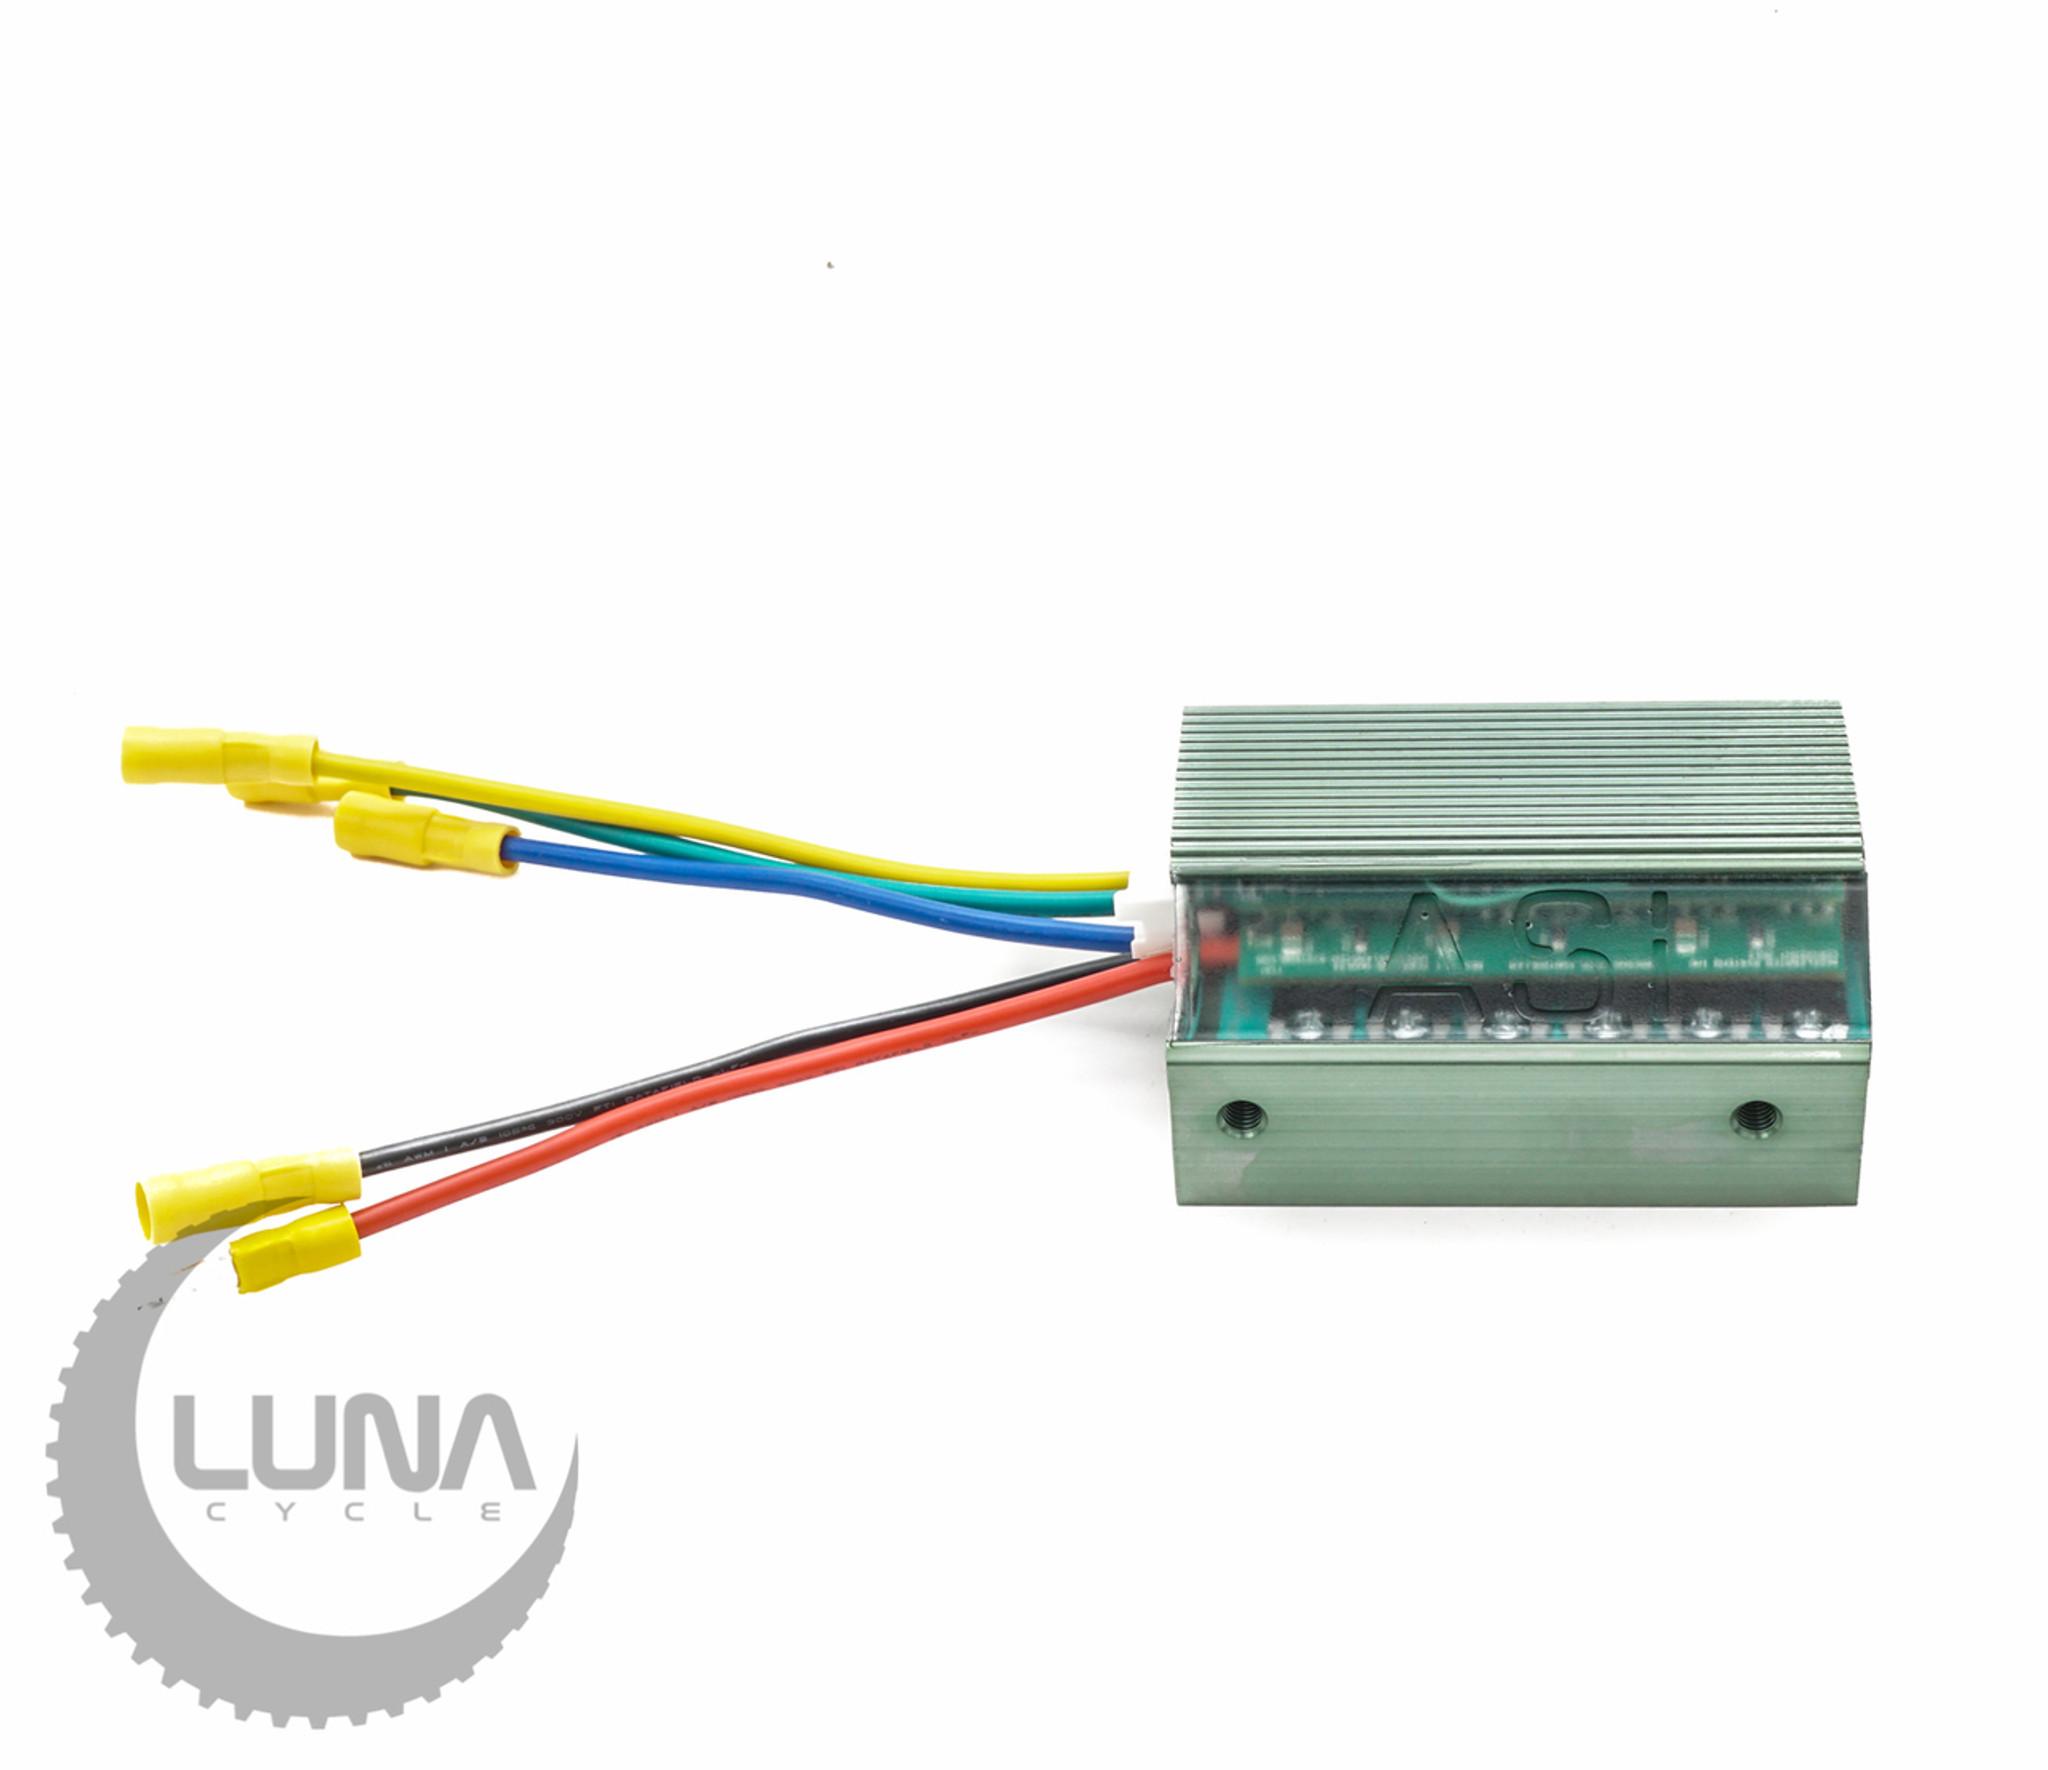 Asi Bac 800 Controller 72v Version Luna Cycle Wiring Diagram